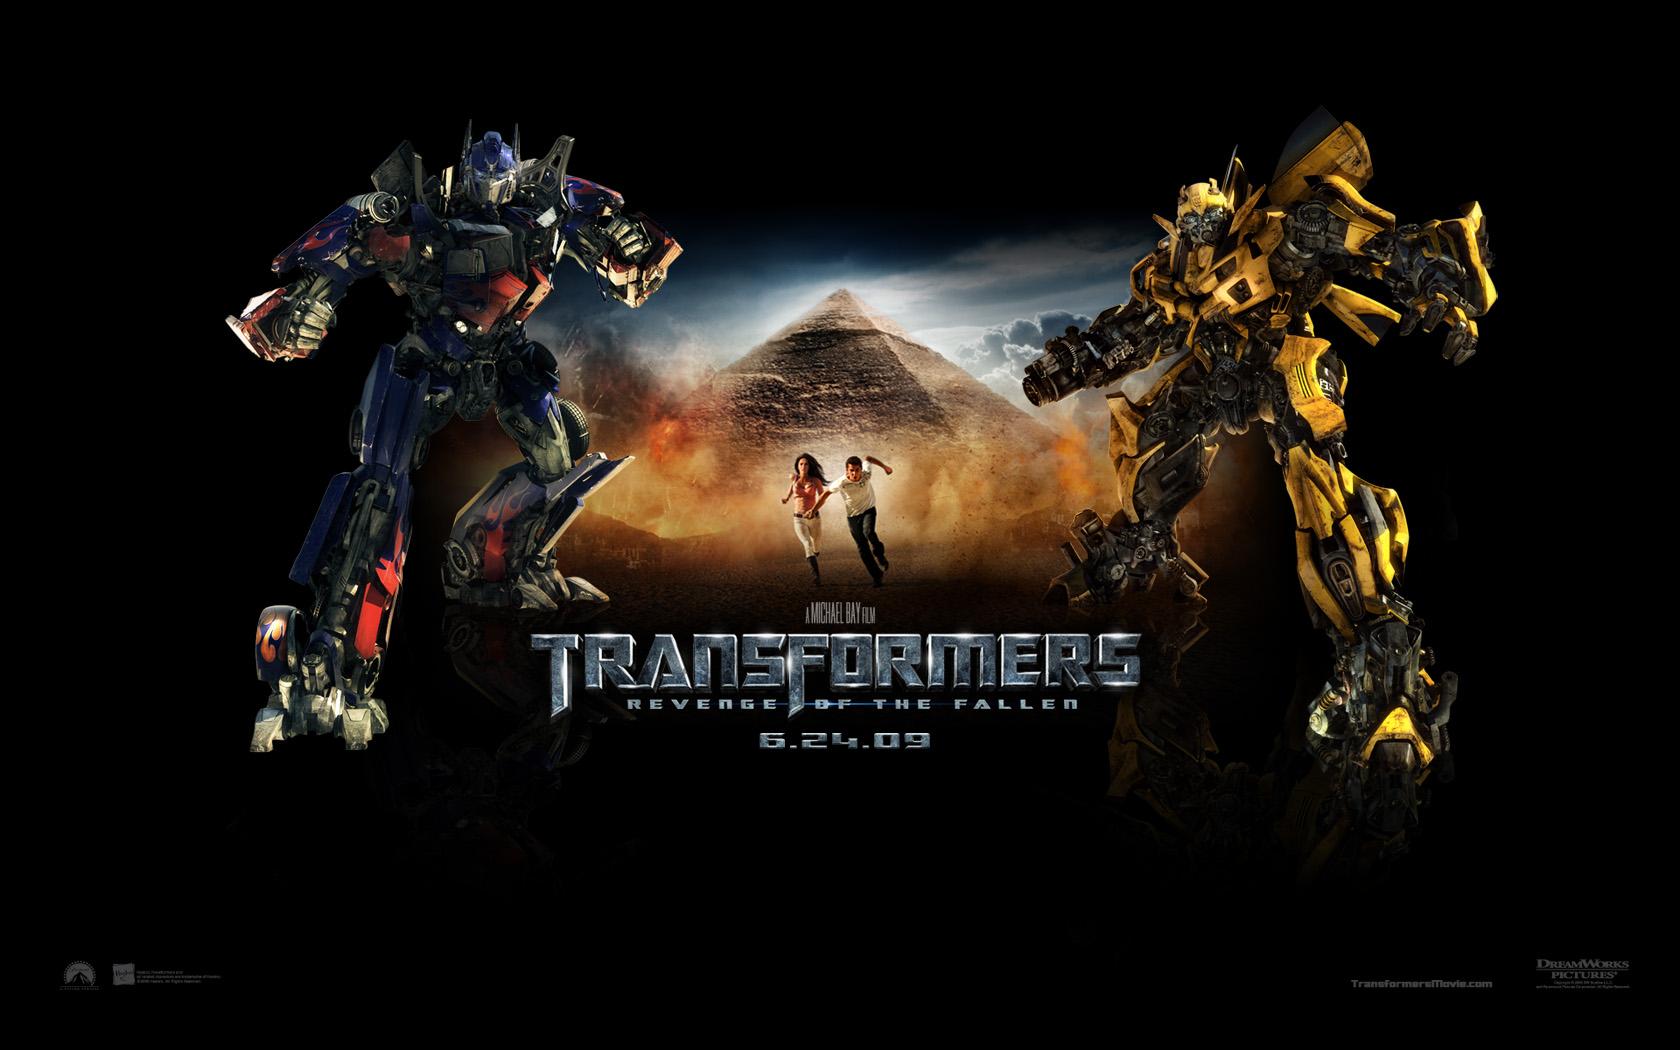 Megan_Fox_in_Transformers _Revenge_of_the_Fallen_Wallpaper_1_1024